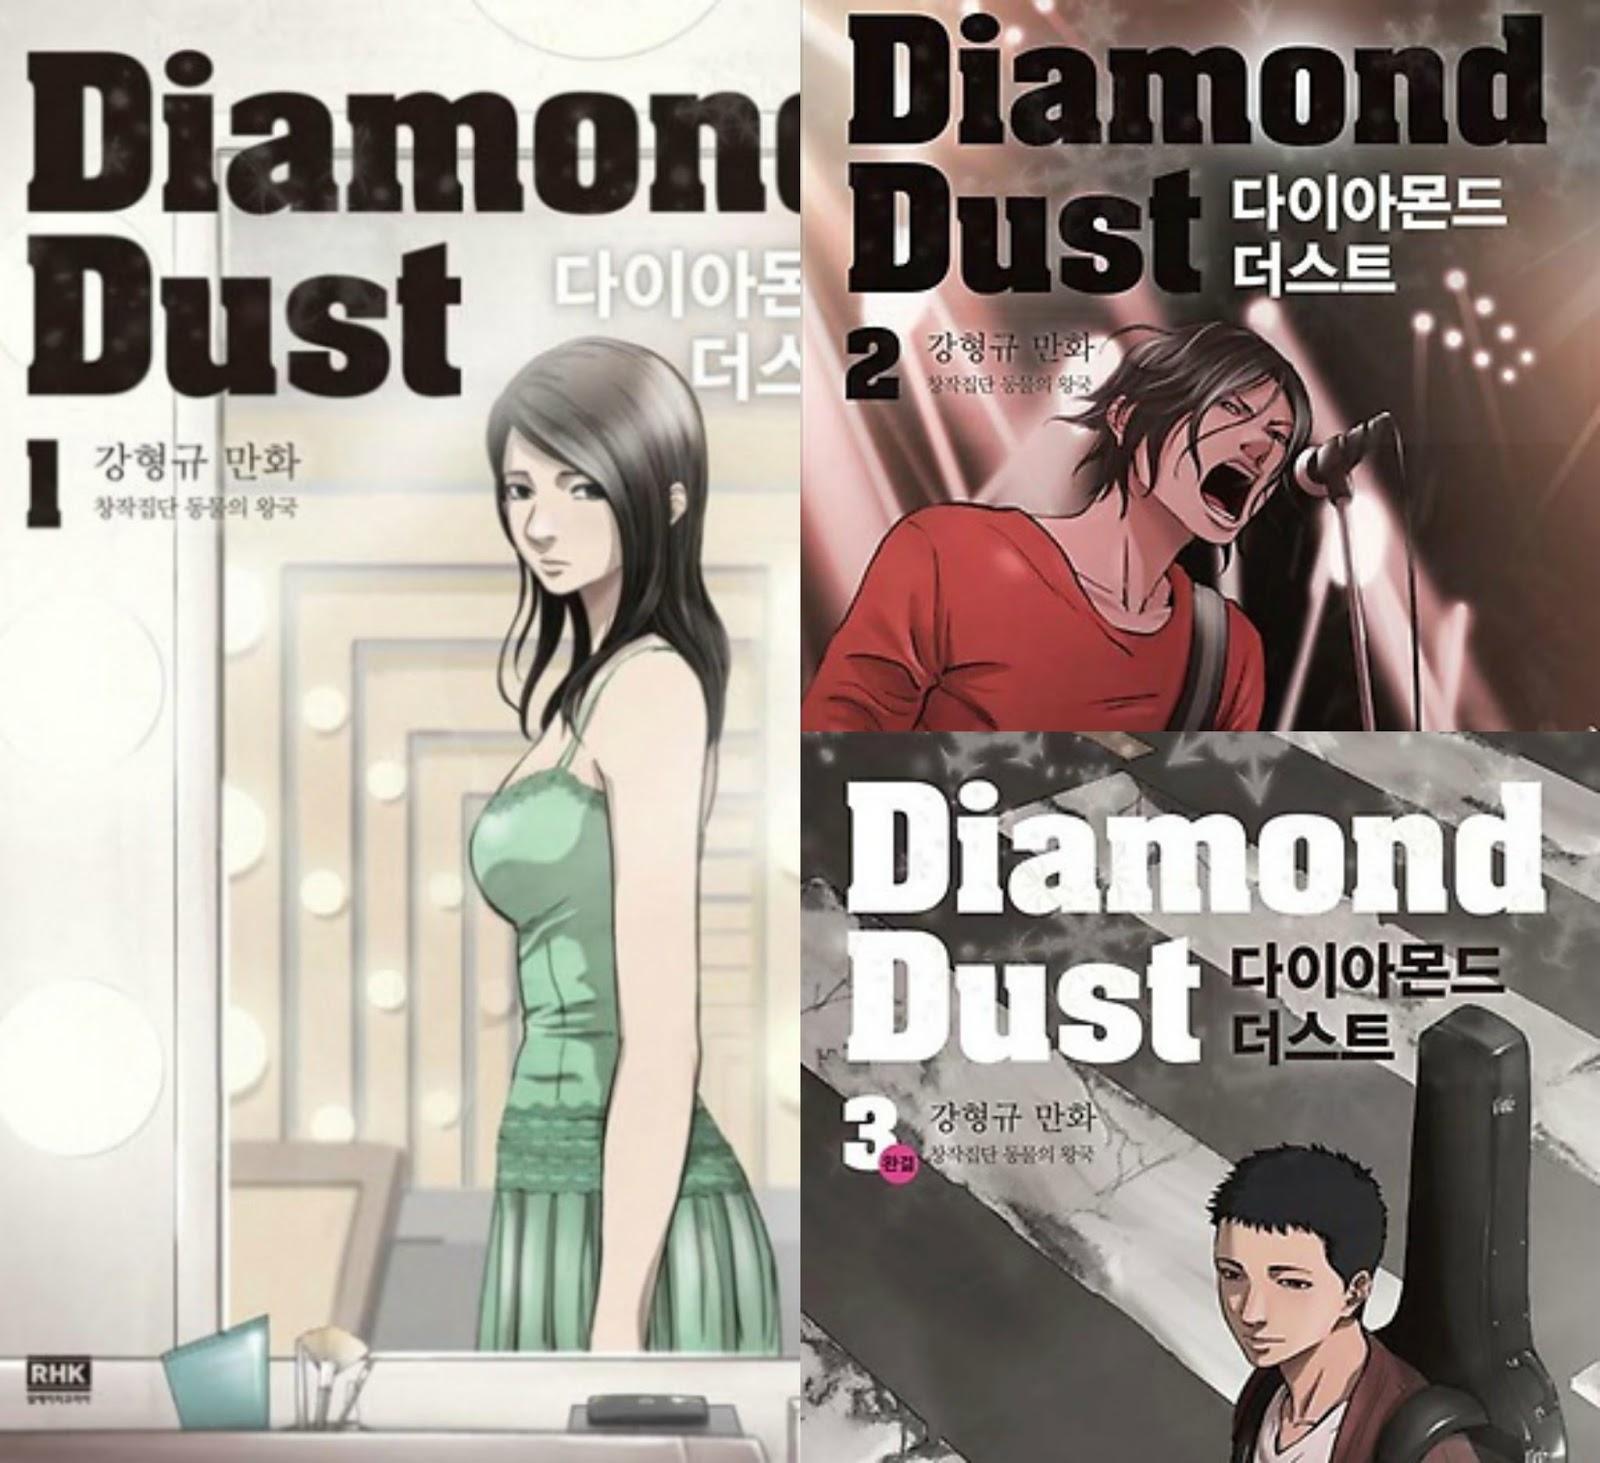 Reseña: Diamond Dust (Manhwa) de Kang Hyung-Gyu